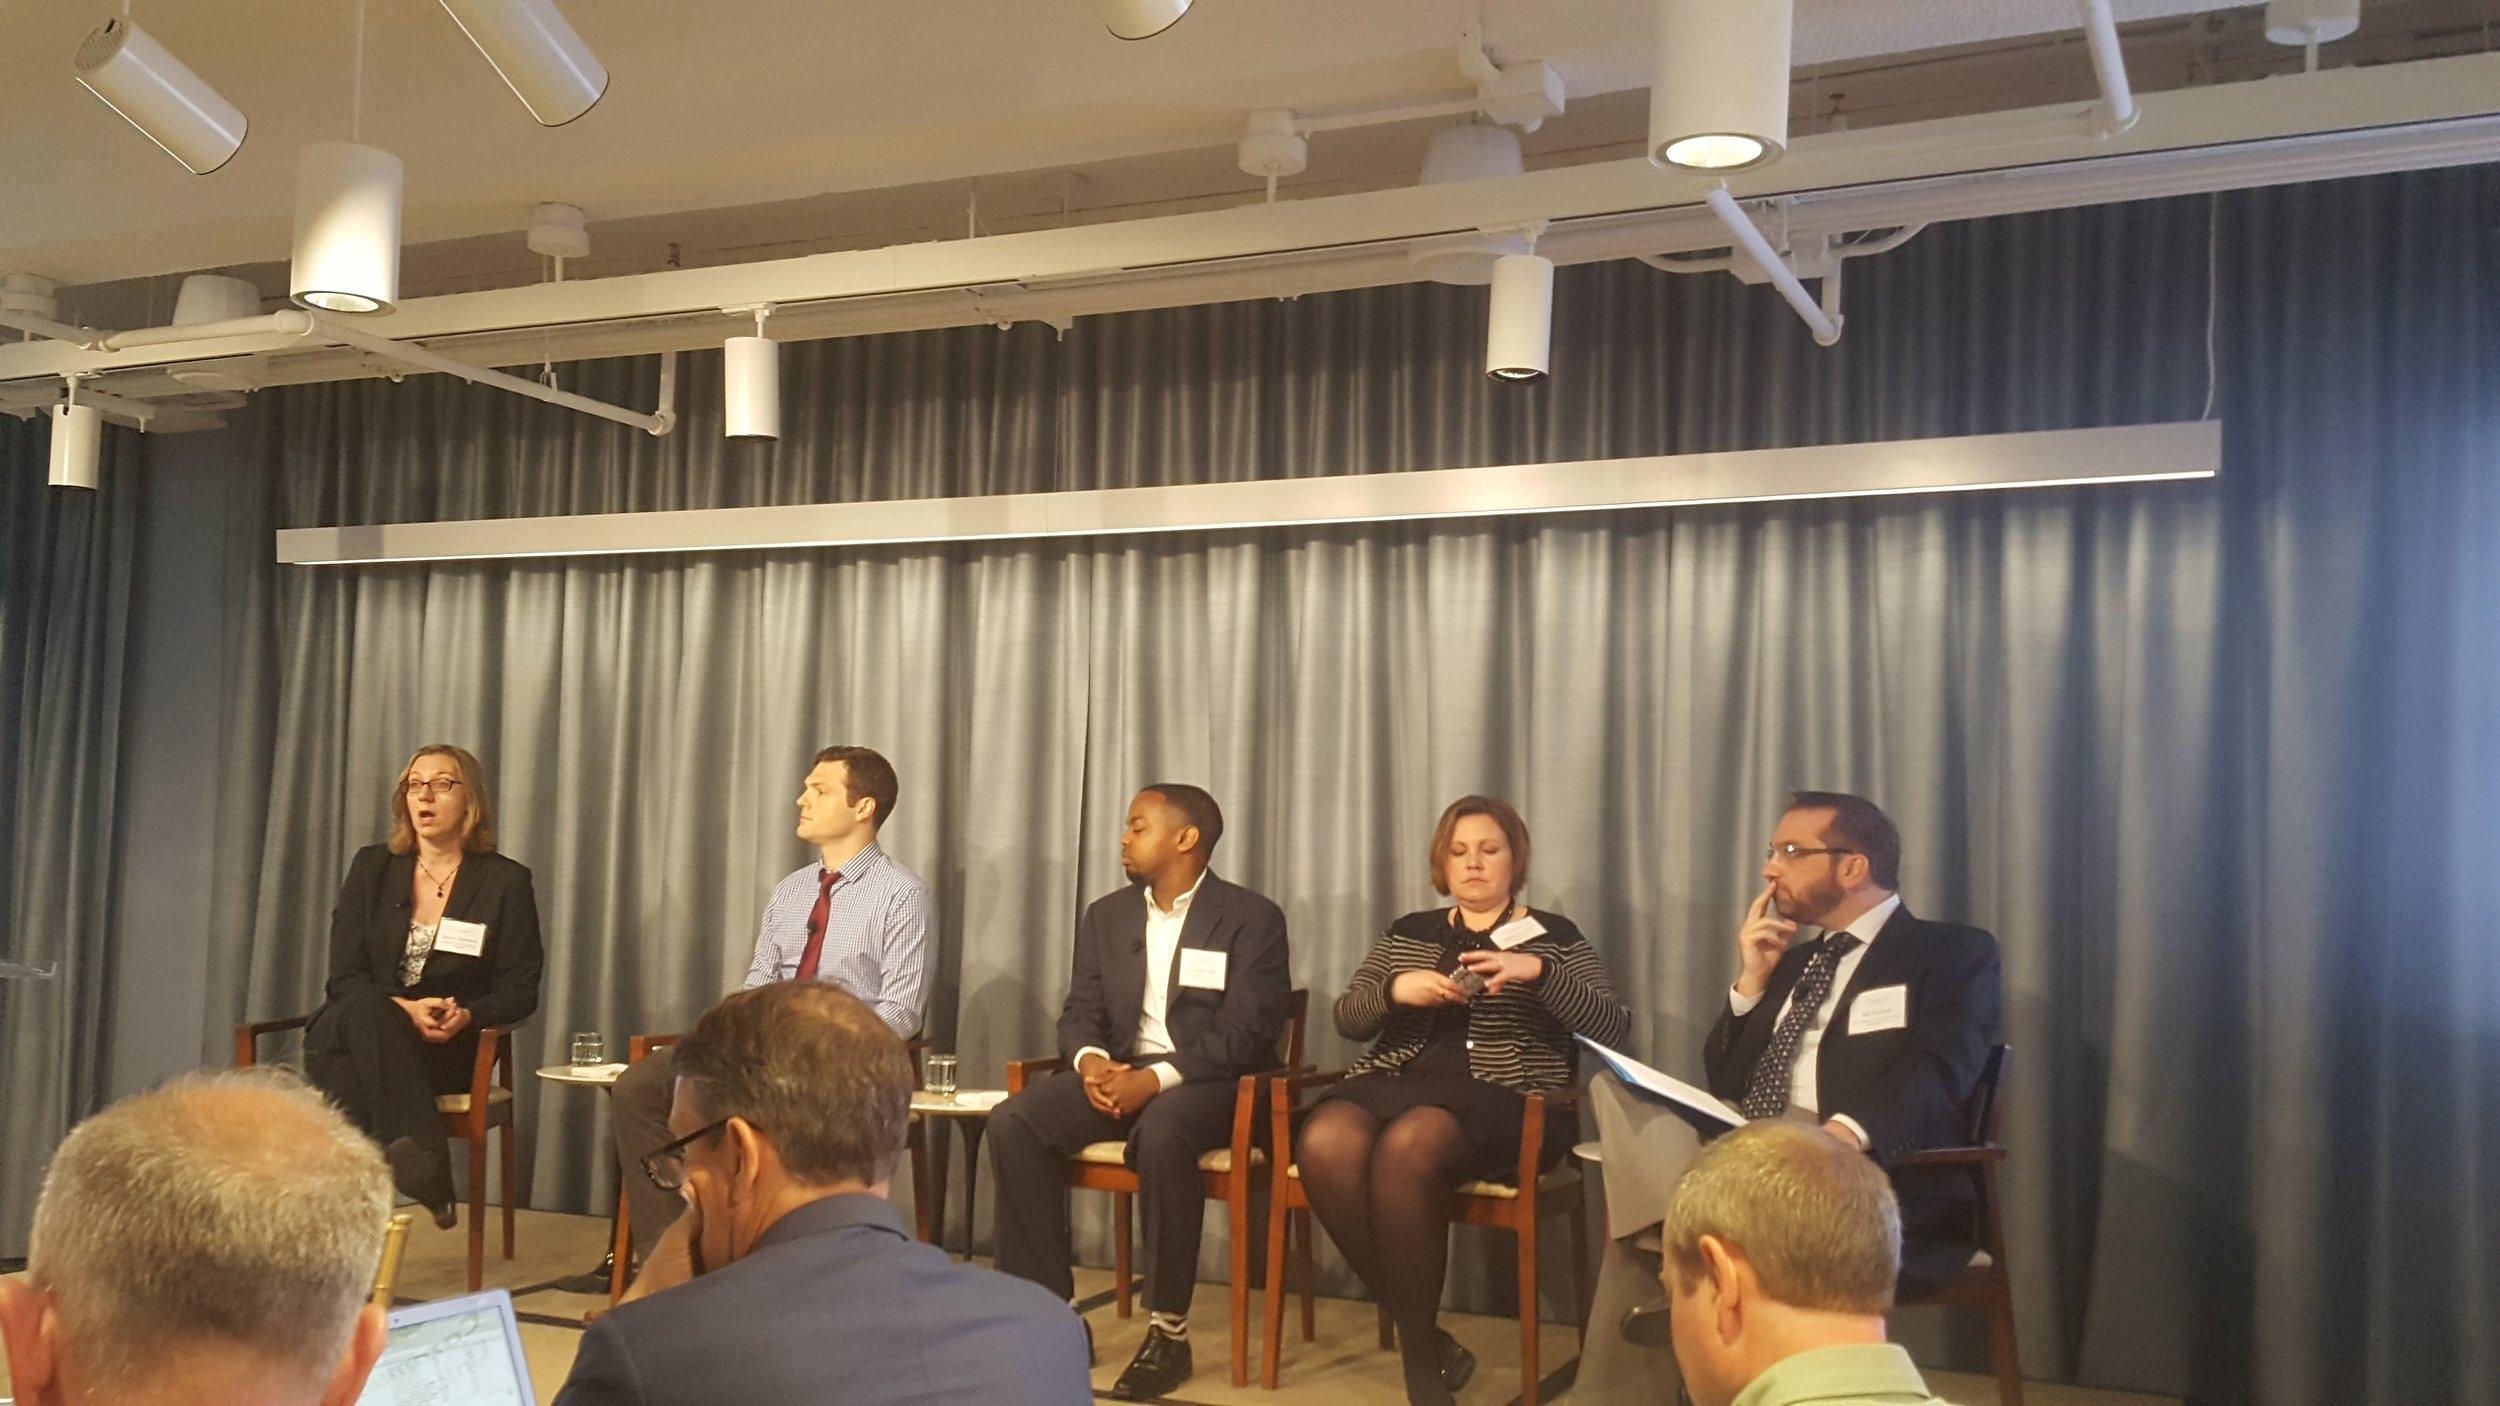 Sandy Misiewicz, CDTC, kicks off the first dialogue spotlighting emerging livable community programs